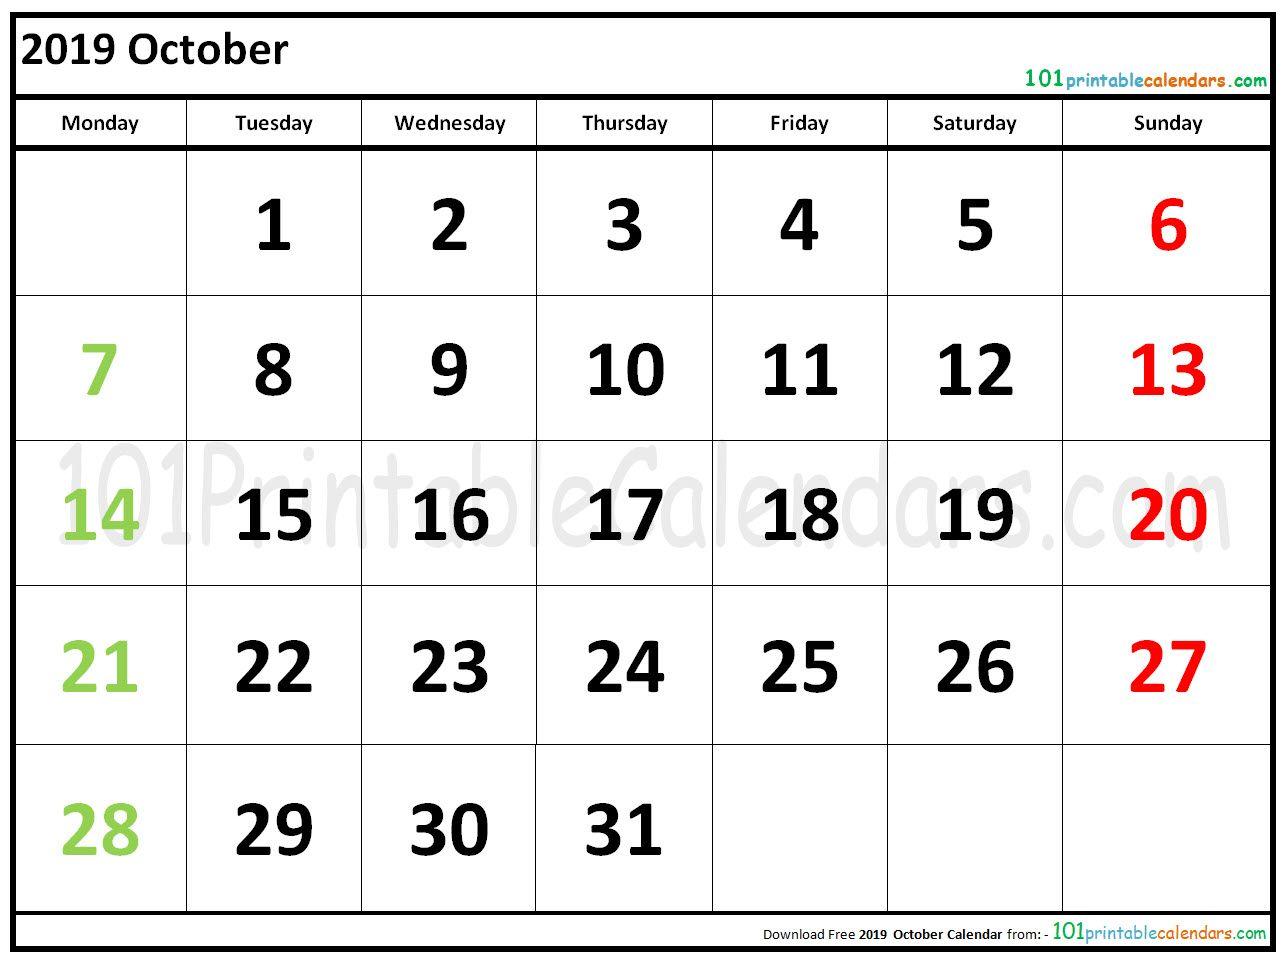 2019 October Calendar October Calendar January Calendar